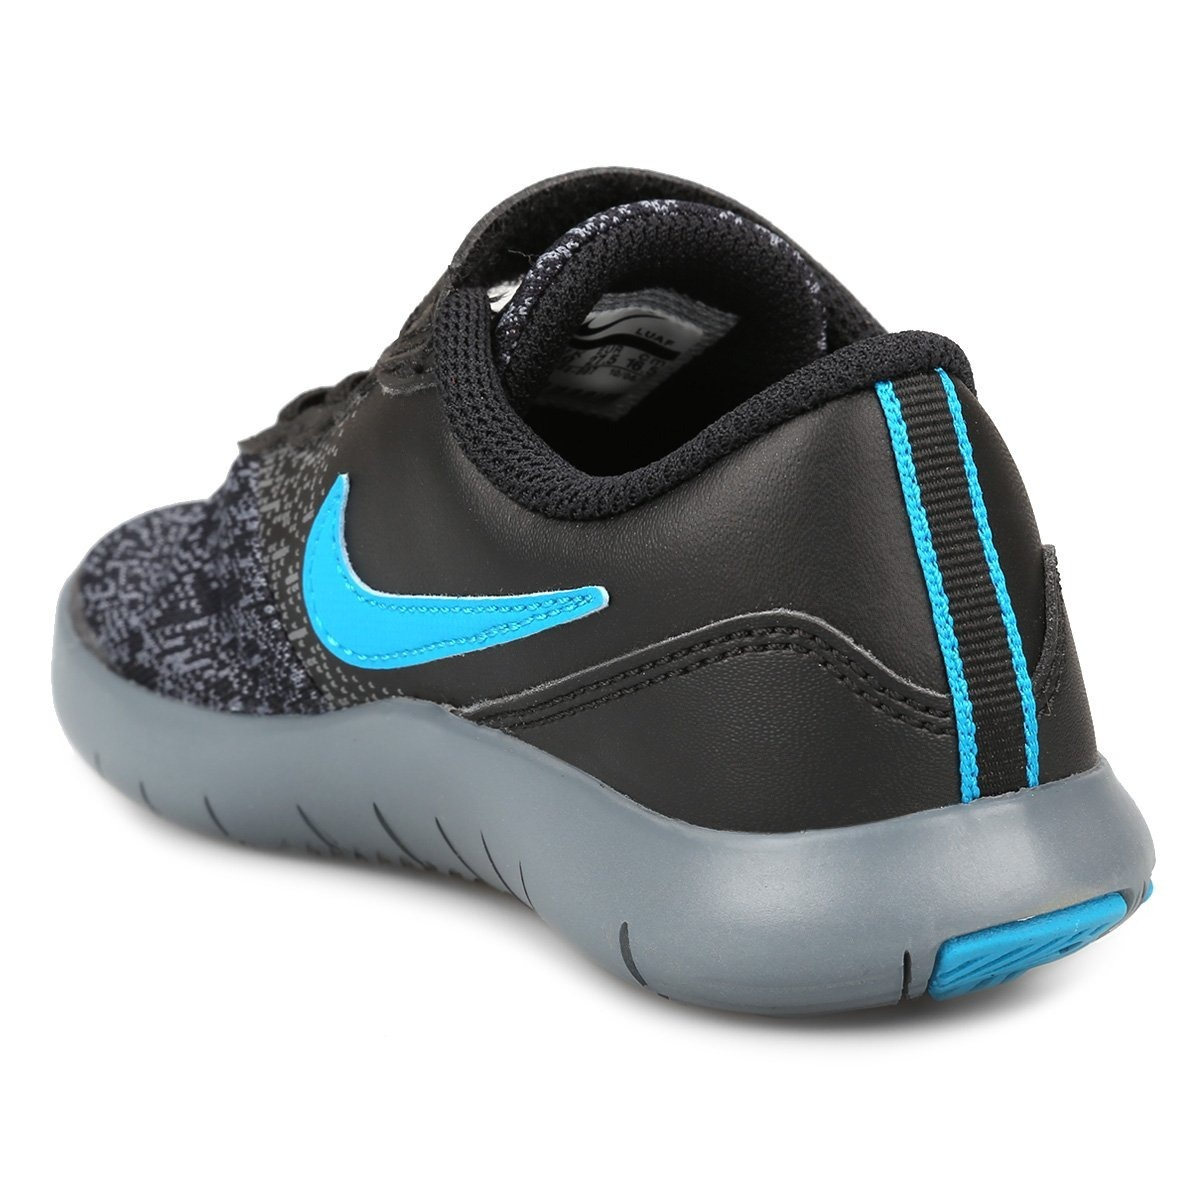 zapatillas nike flex contact boys ps infantil. Cargando zoom. 6f70fc5521649